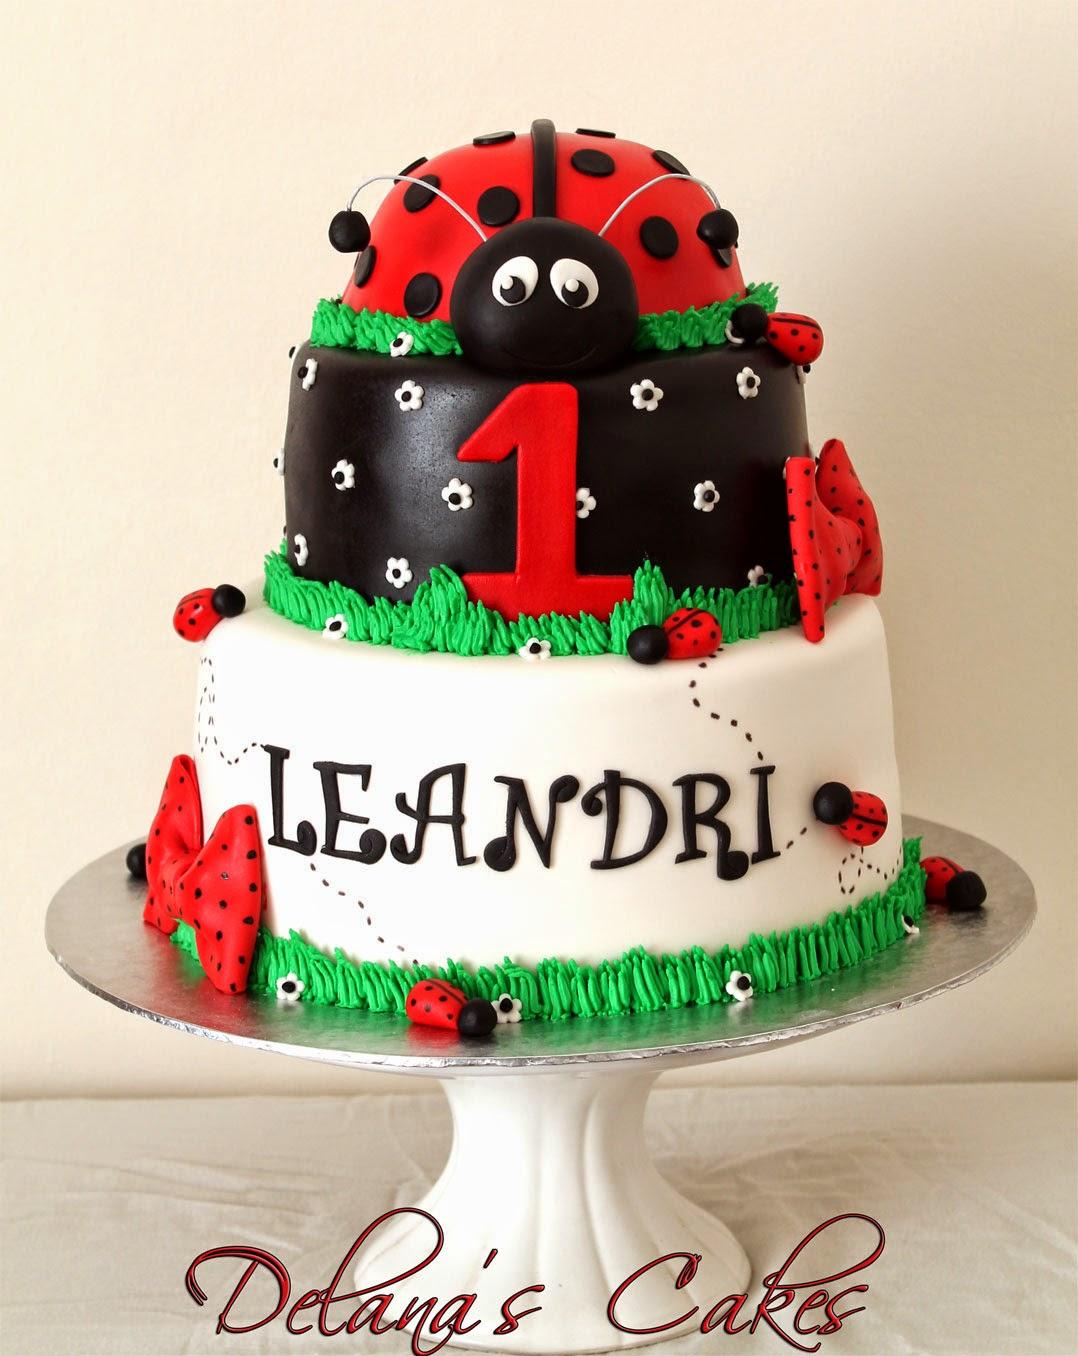 Delanas Cakes Ladybug Birthday Cake